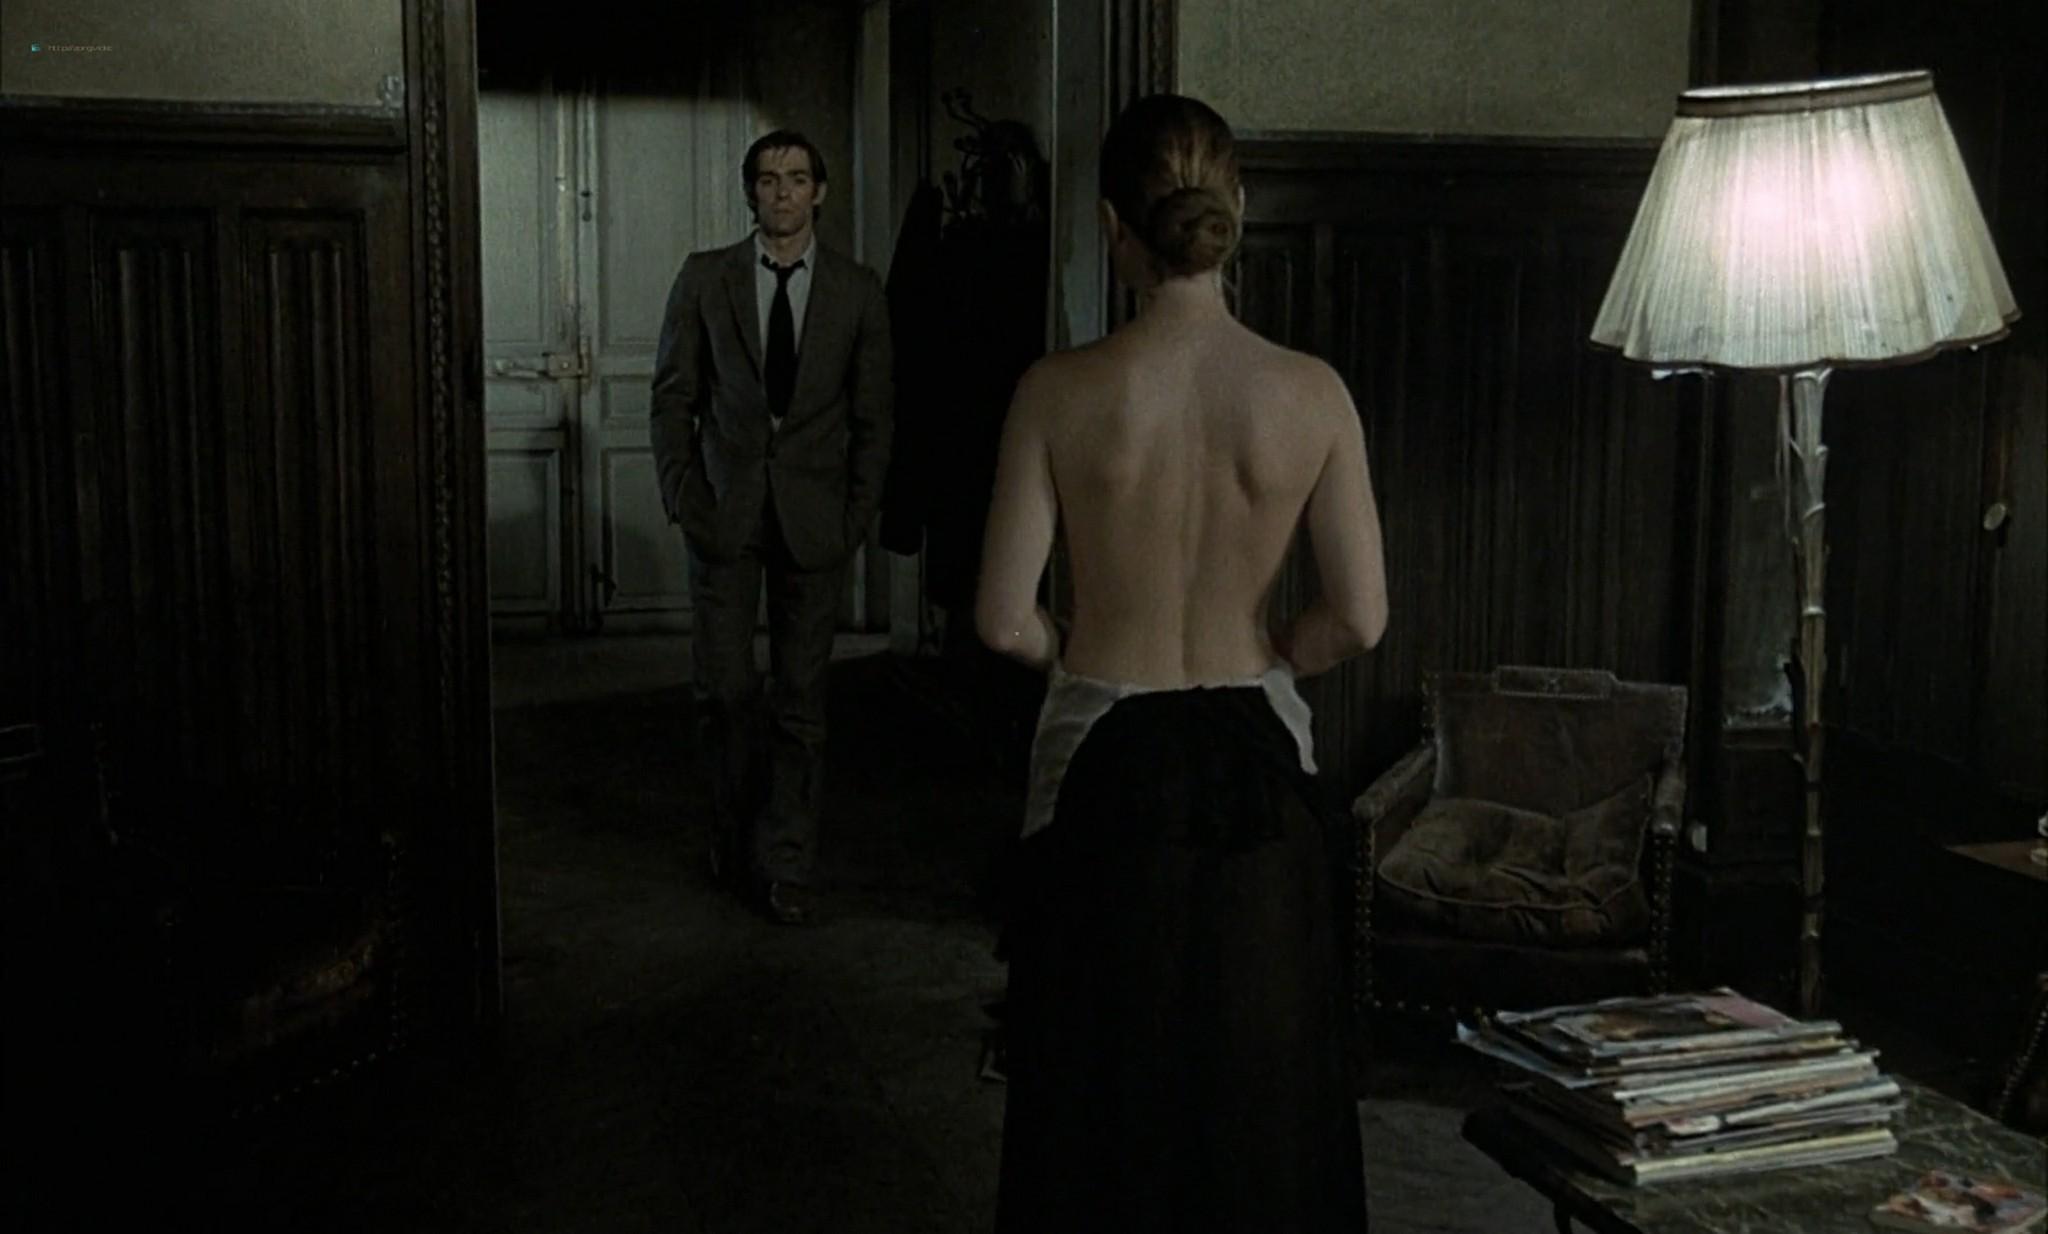 Romy Schneider nude butt Nadia Vasil bush others orgy - L'important c'est d'aimer (FR-1975) HD 1080p BluRay (2)